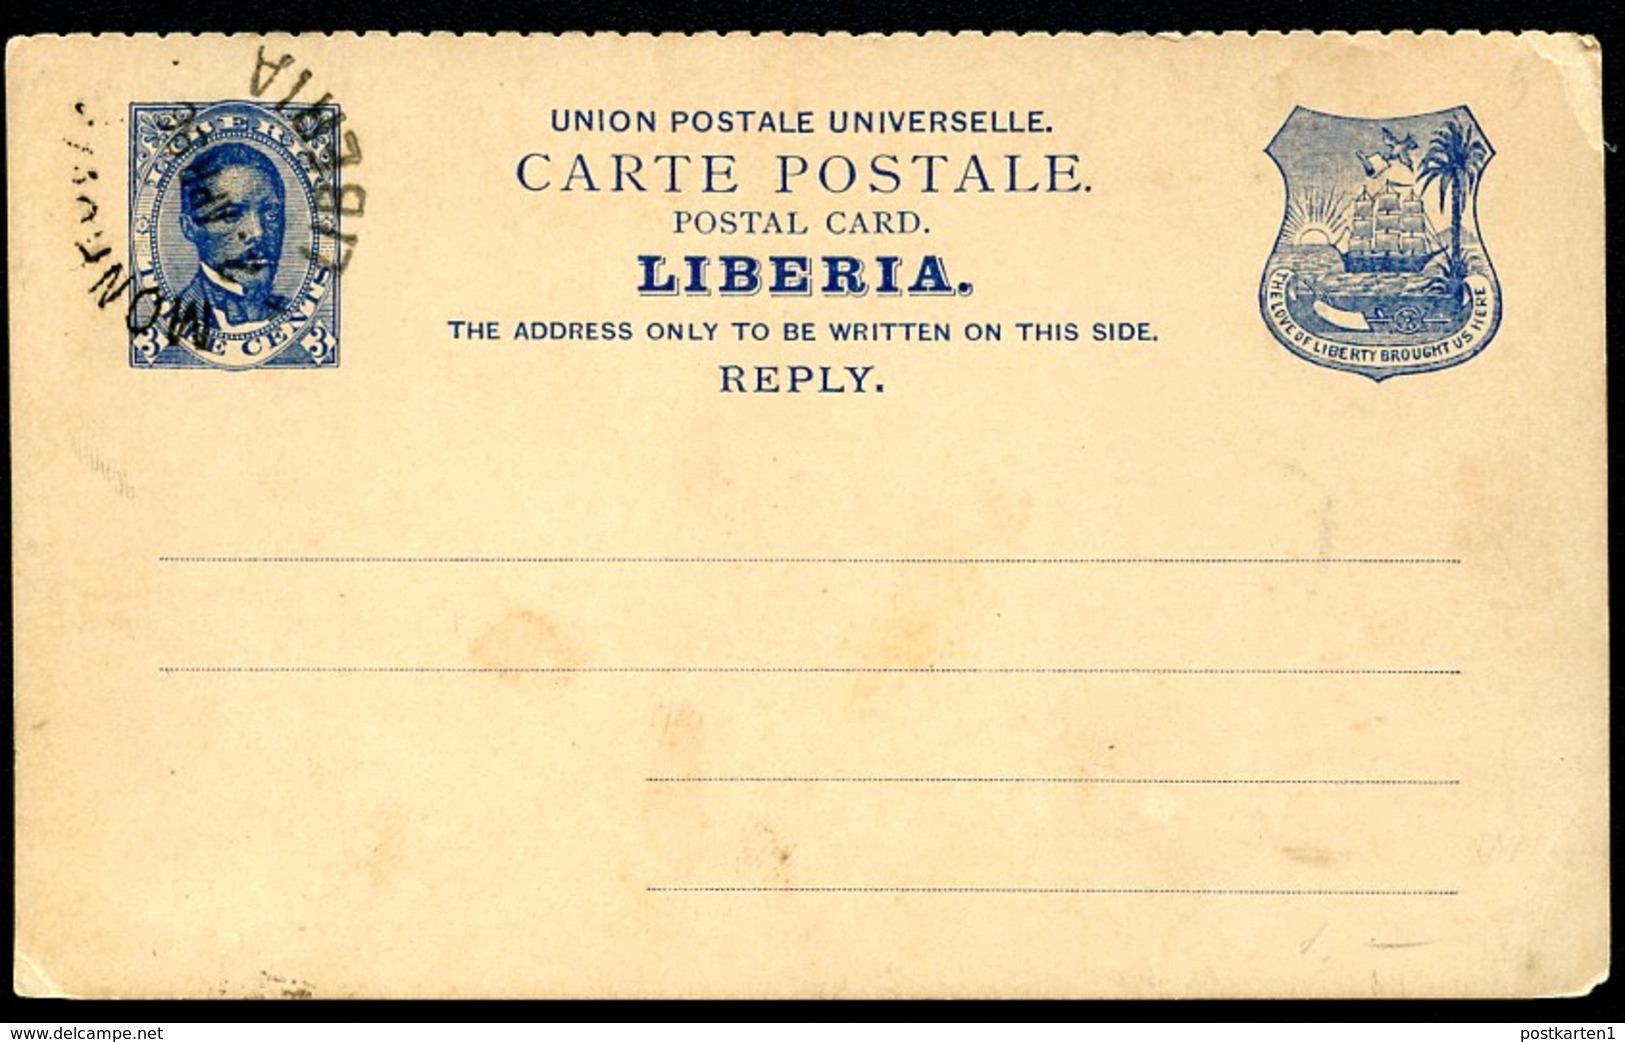 LIBERIA Reply Postal Card #5 President Benson MONROVIA 1896 - Liberia